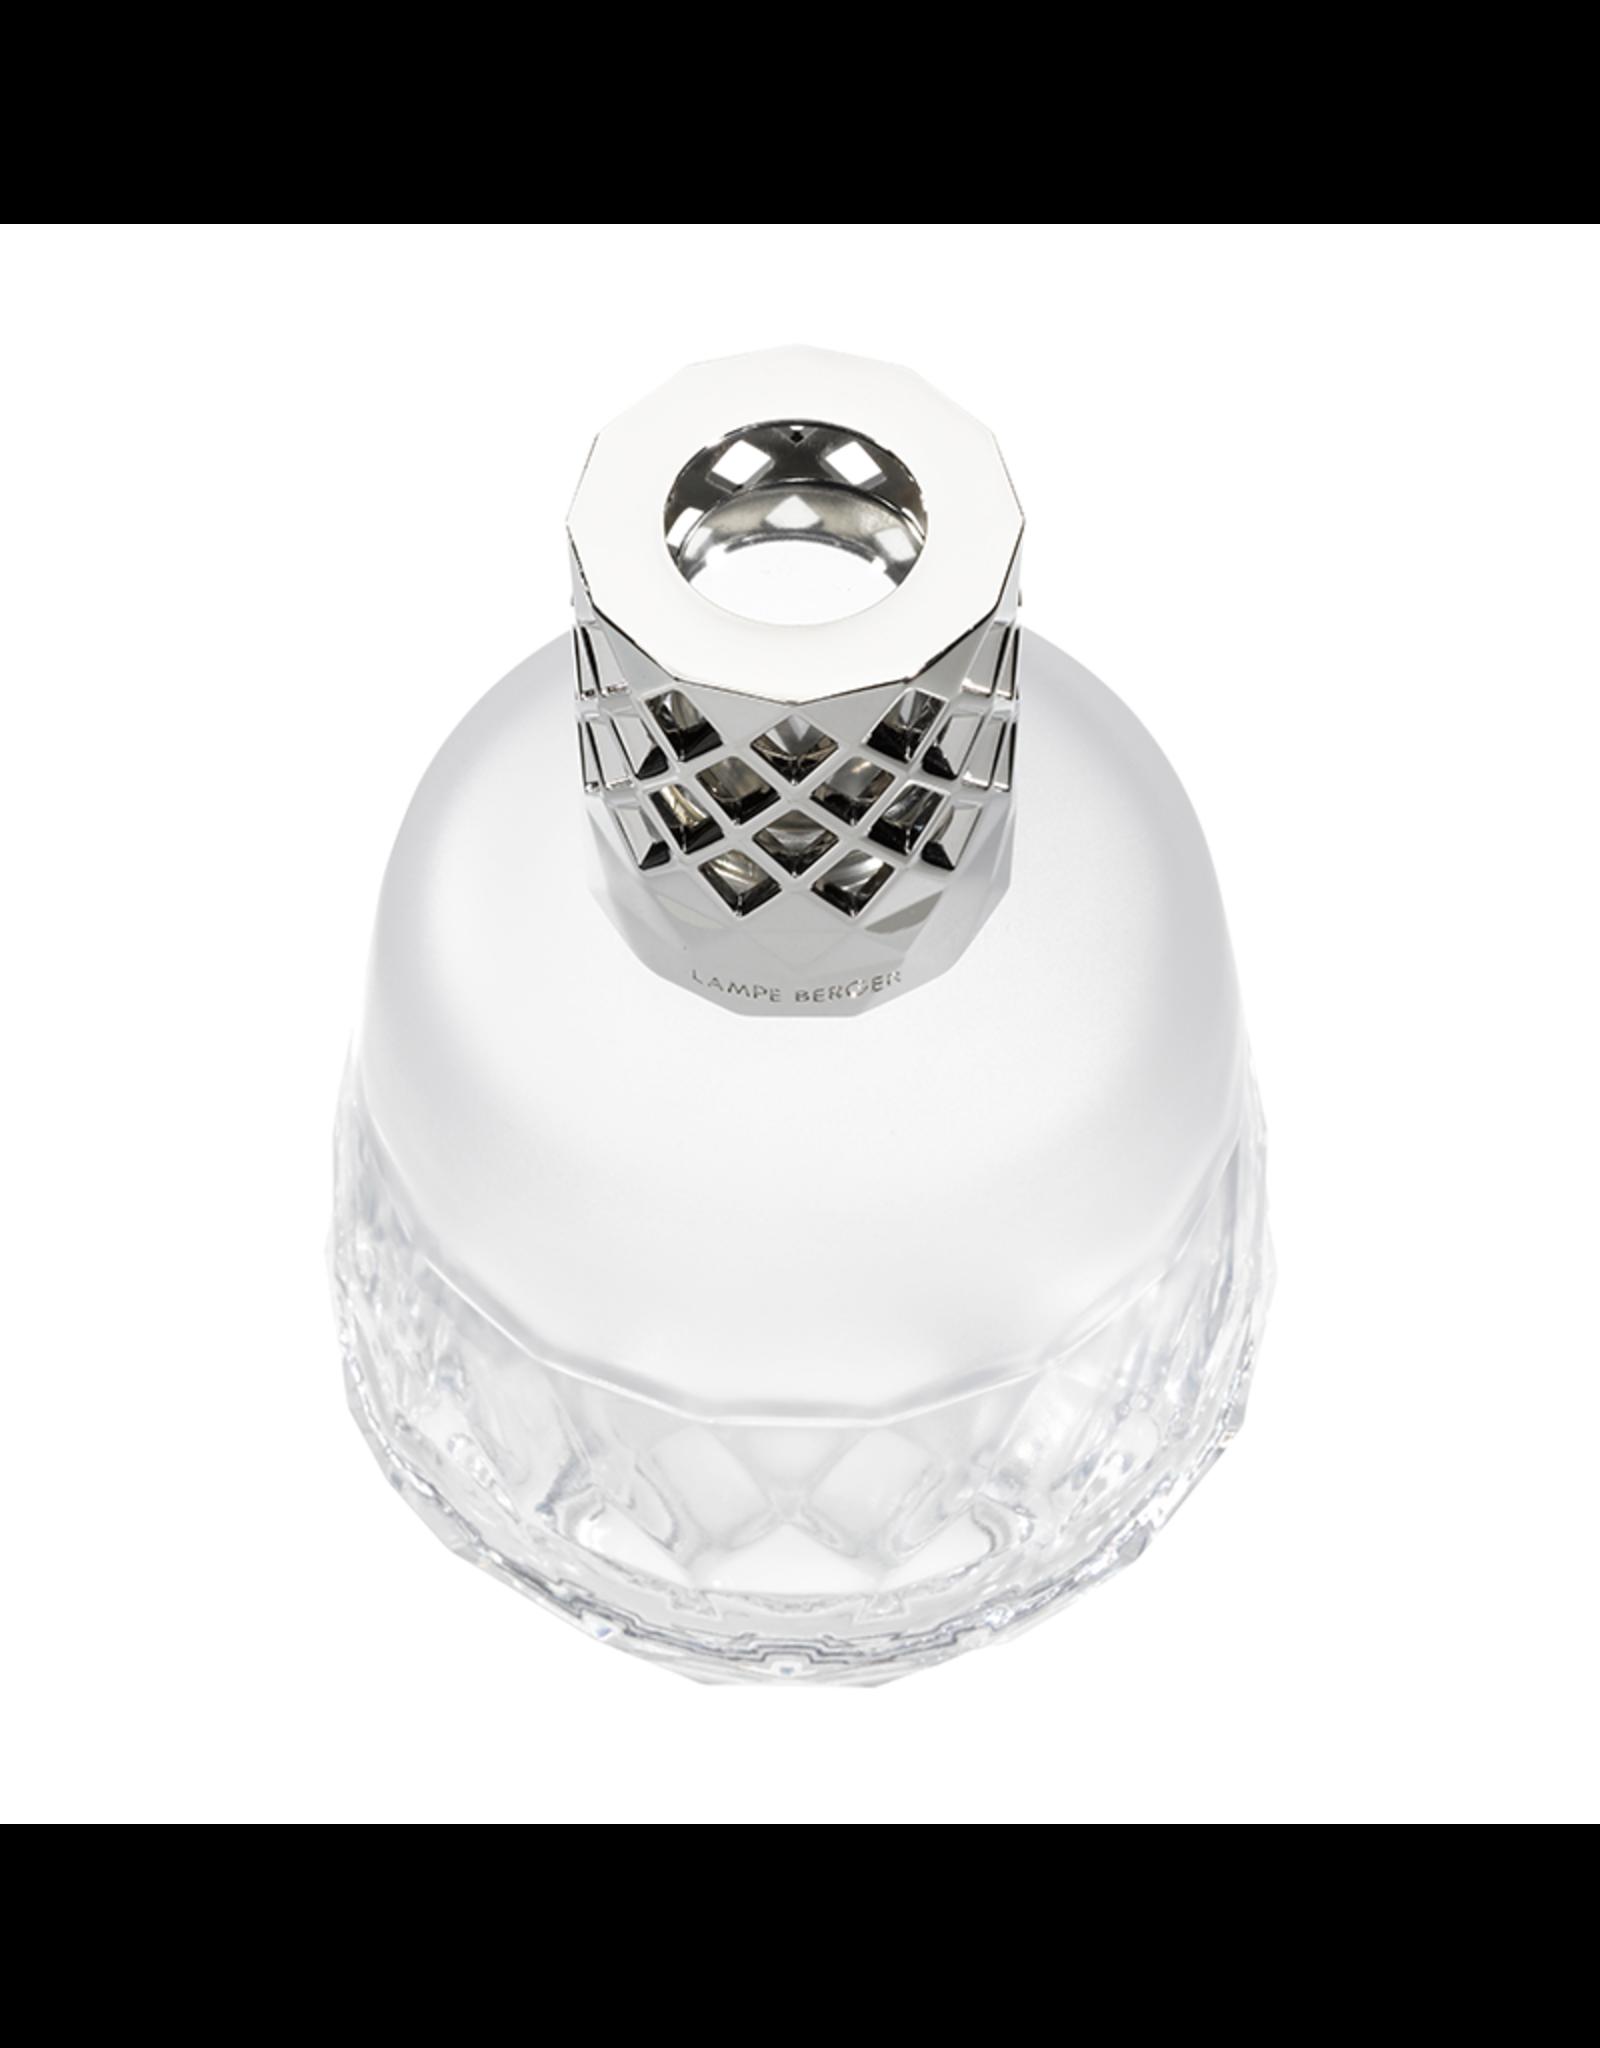 Lampe Berger Geurbrander Clarity - Transparant